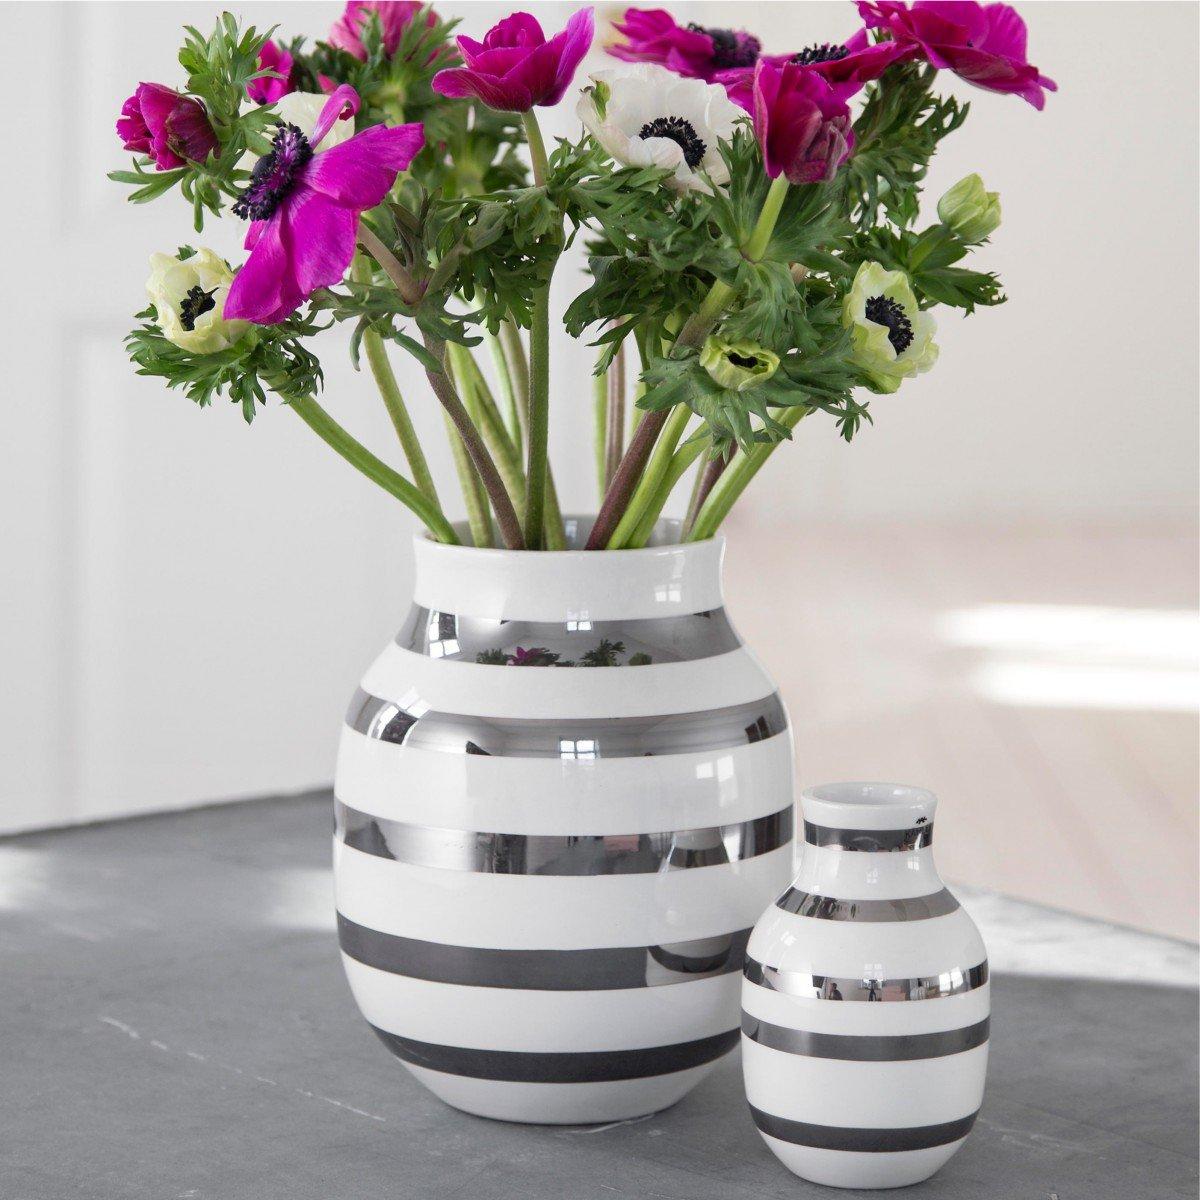 Kähler Design - Vase   Blaumenvase - Omaggio - Keramik - Weiß   silber - Höhe 20 cm